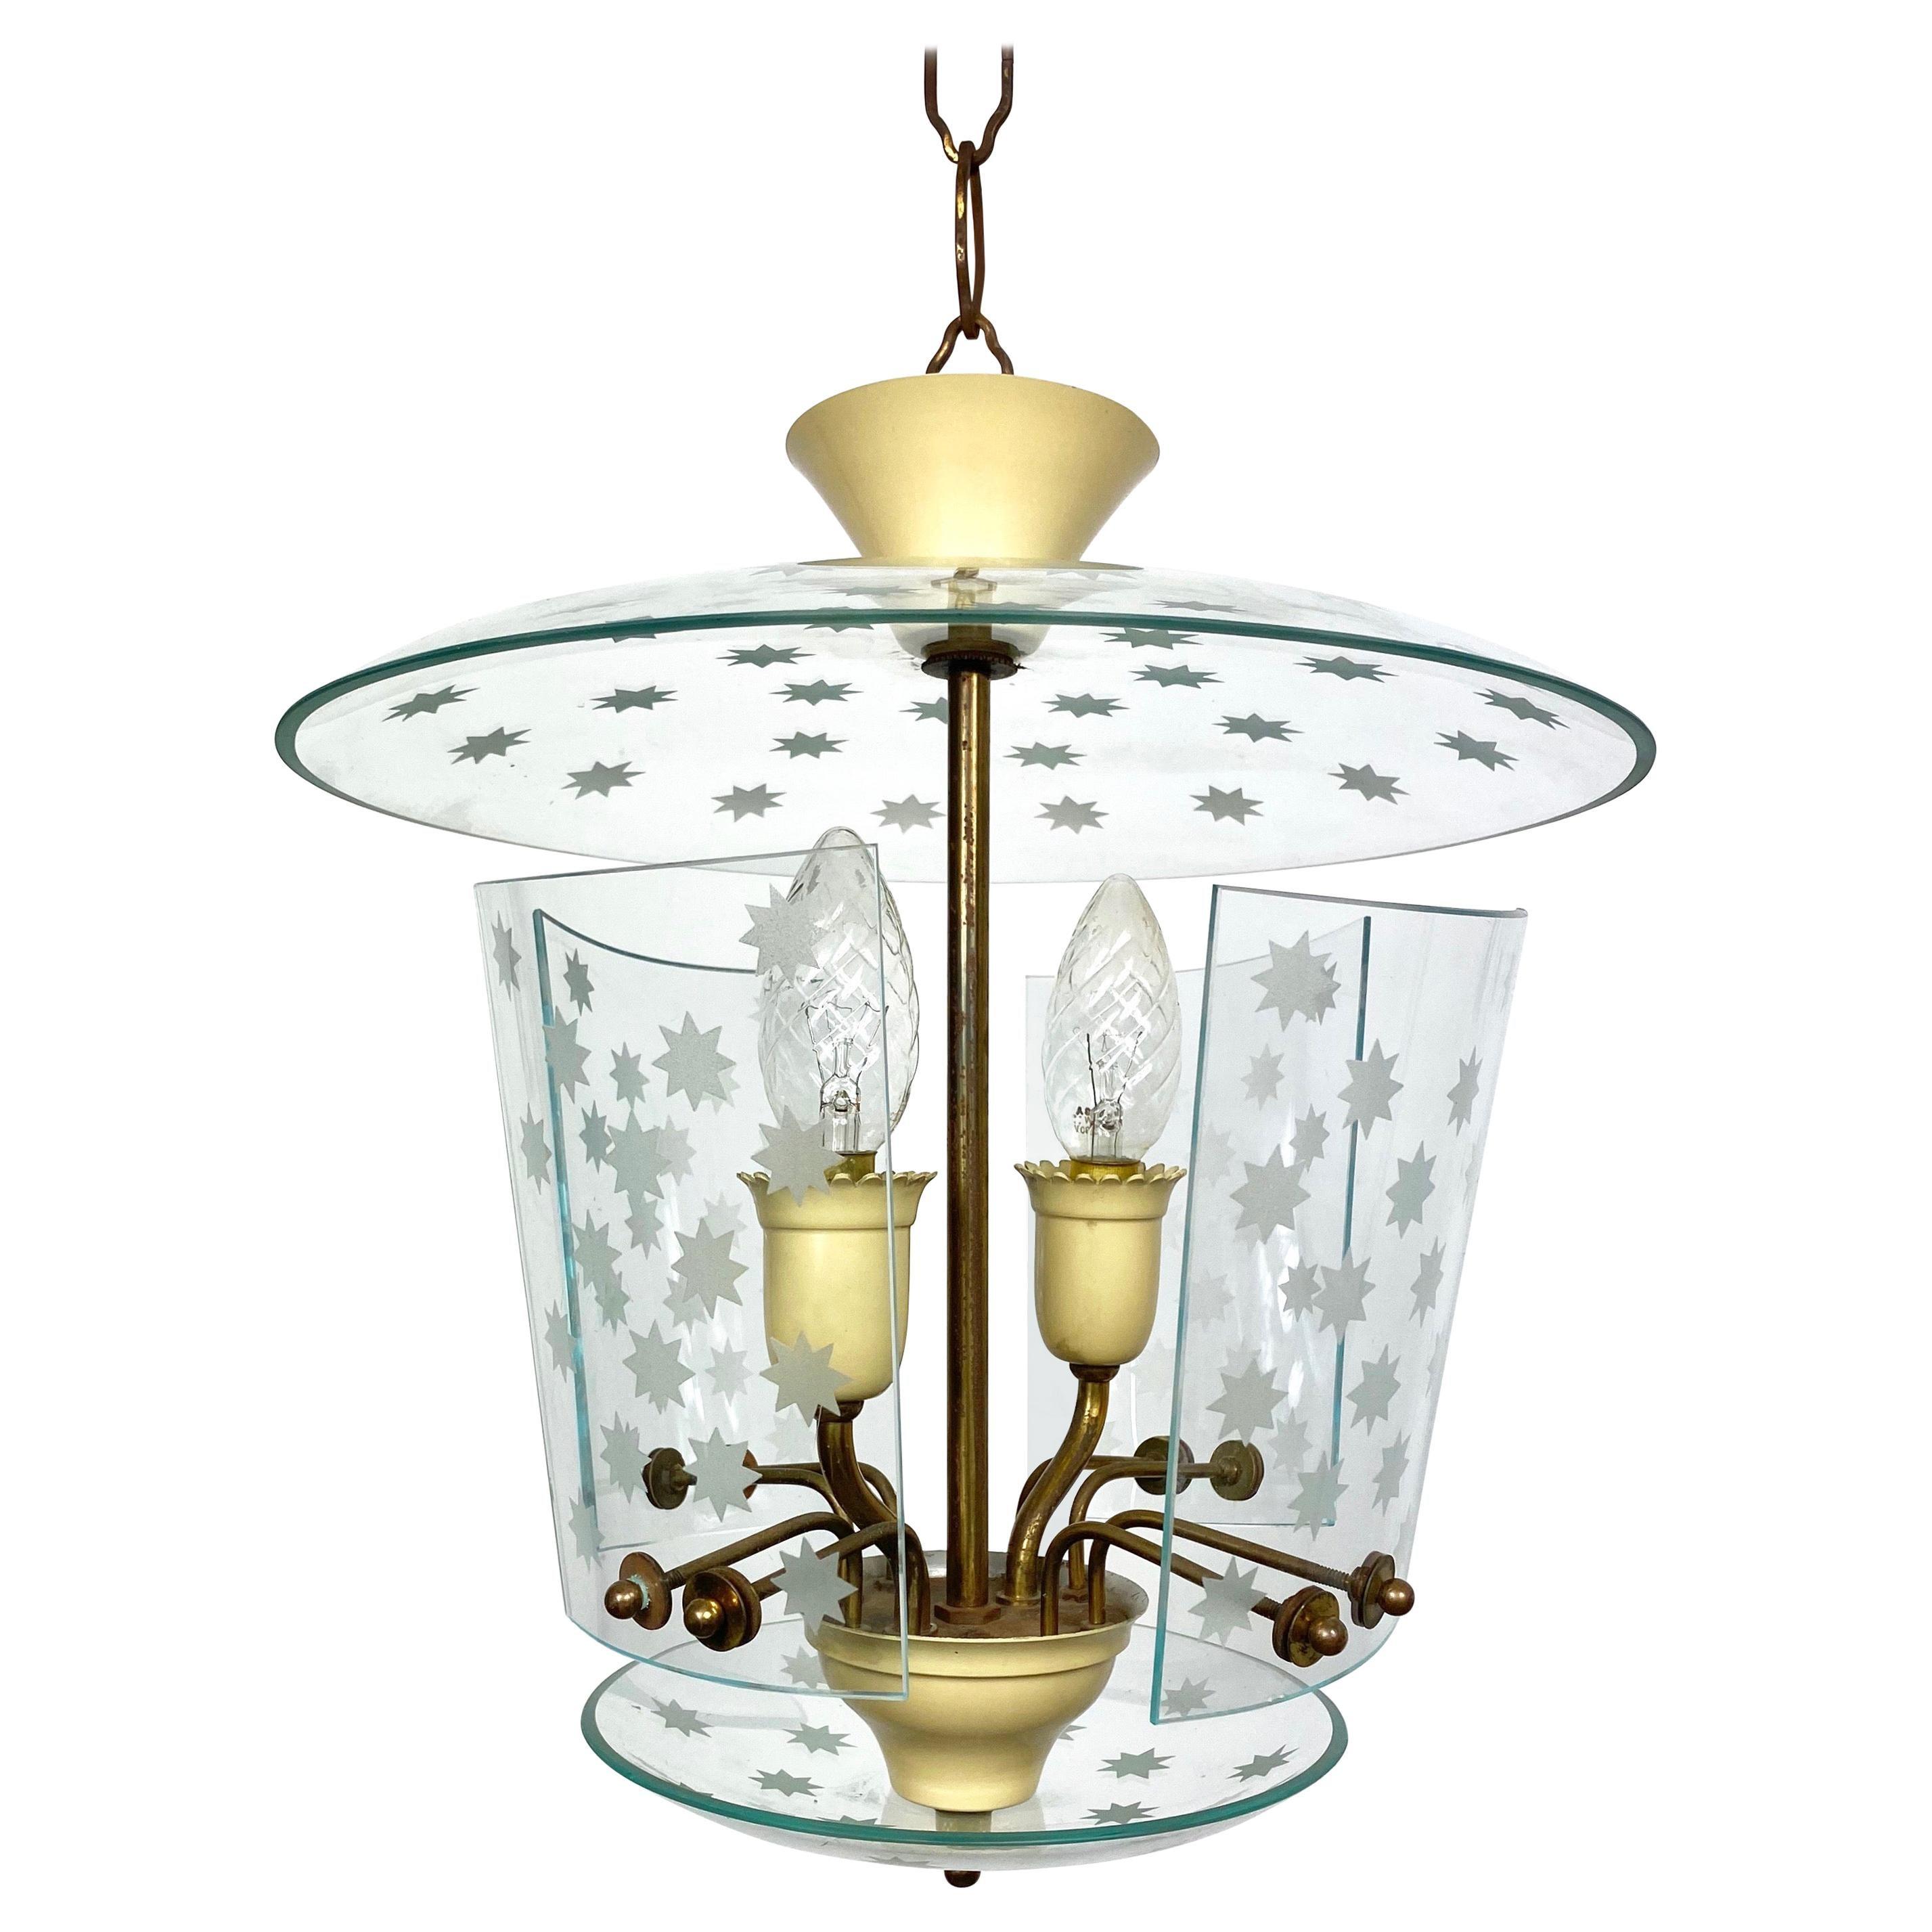 Pietro Chiesa for Fontana Arte Glass and Brass Chandelier Lantern, Italy, 1950s